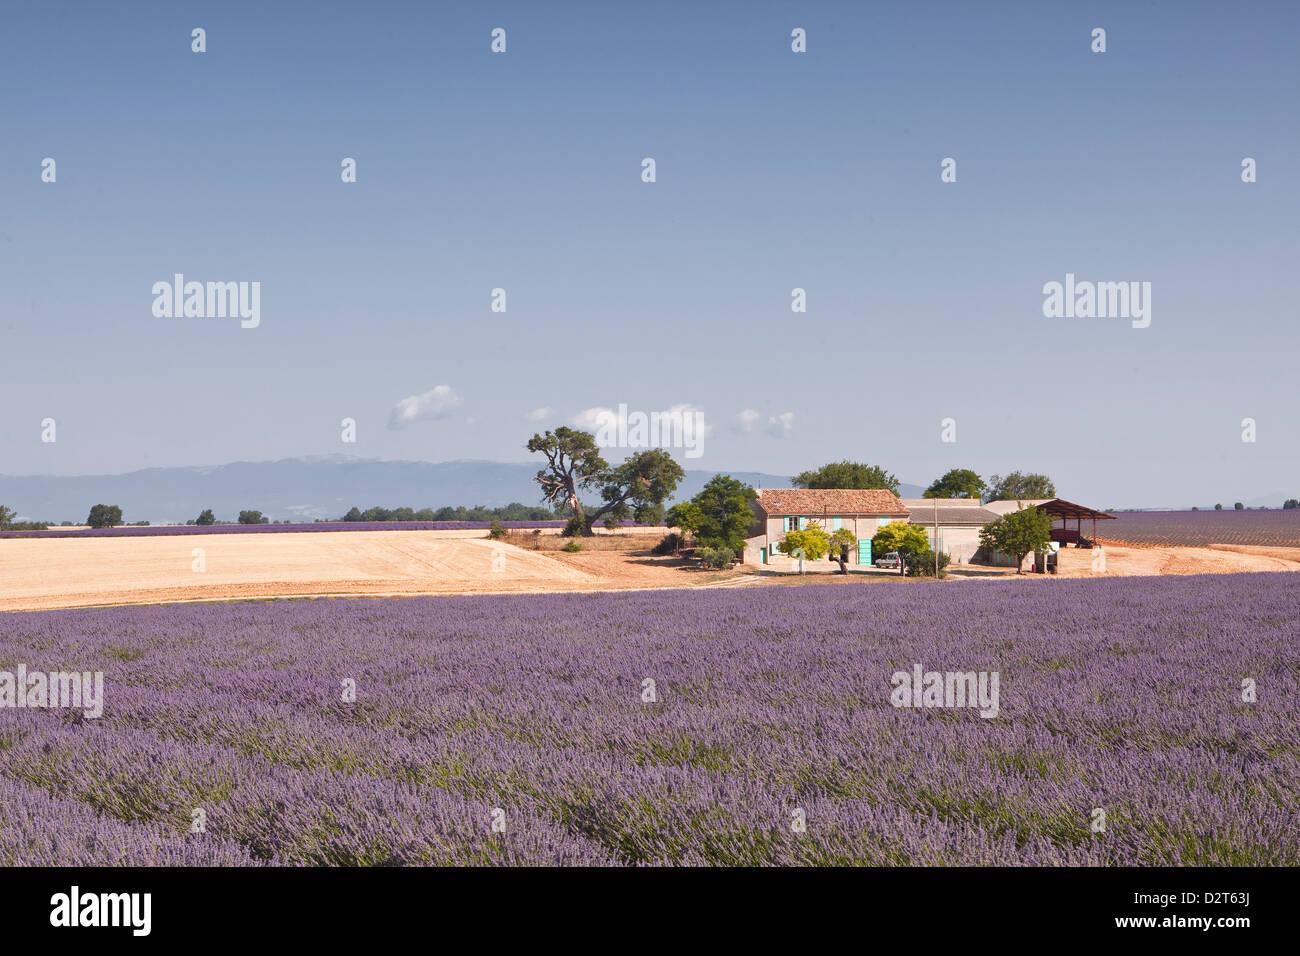 A house amongst lavender fields on the Plateau de Valensole, Alpes de Haute-Provence, Provence, France, Europe - Stock Image